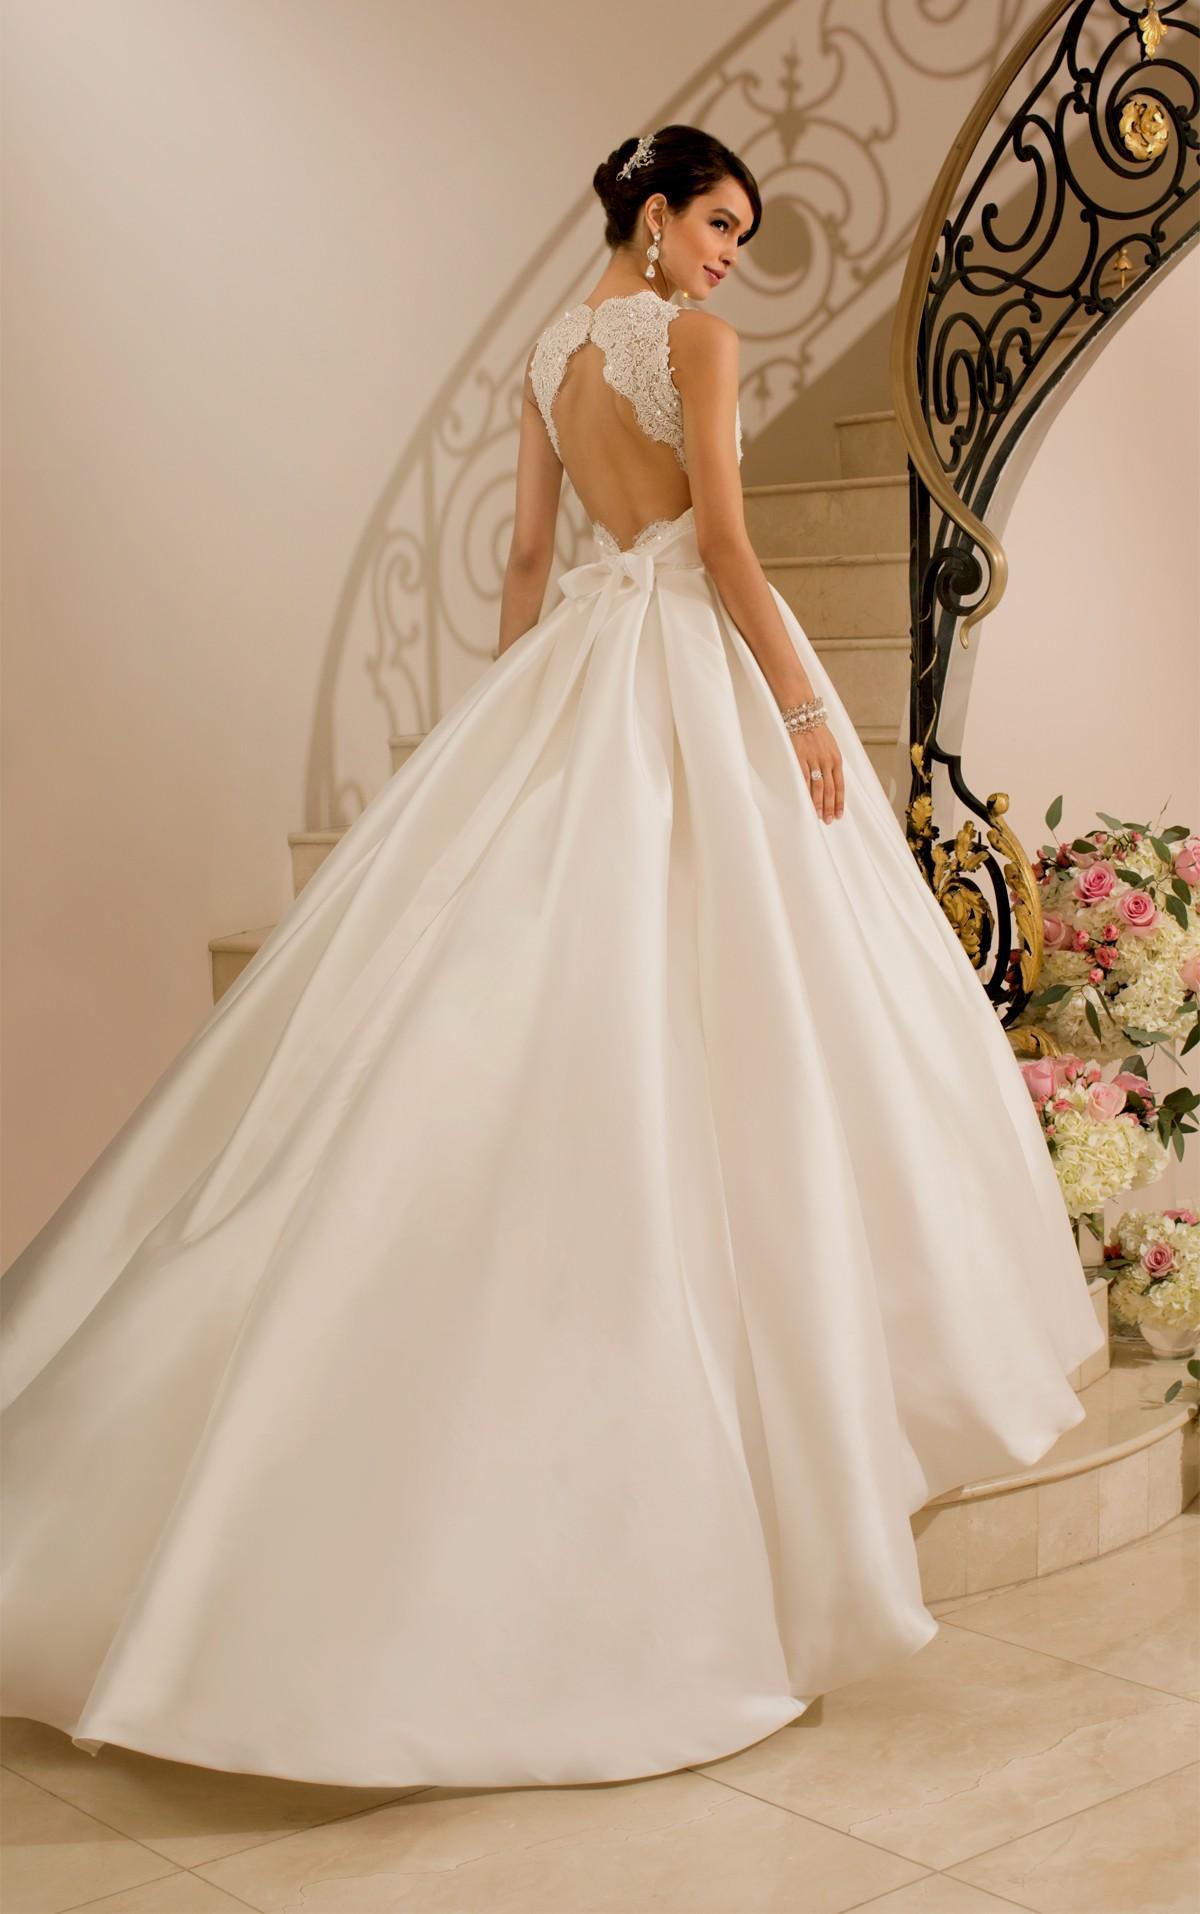 dramatic wedding dresses photo - 1